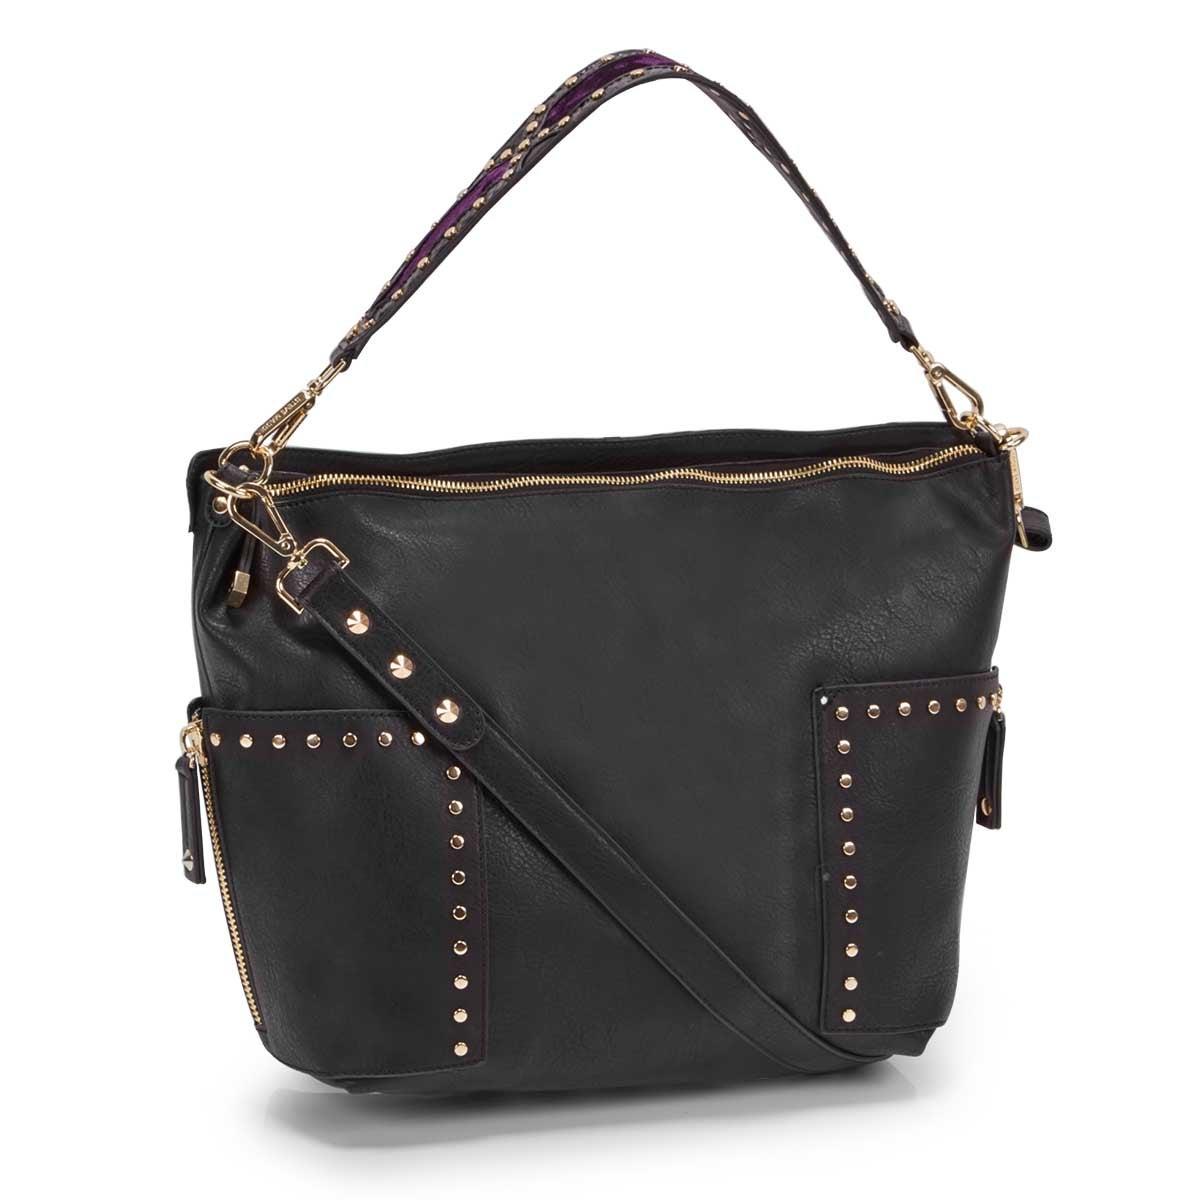 Women's BFRAN black hobo bag